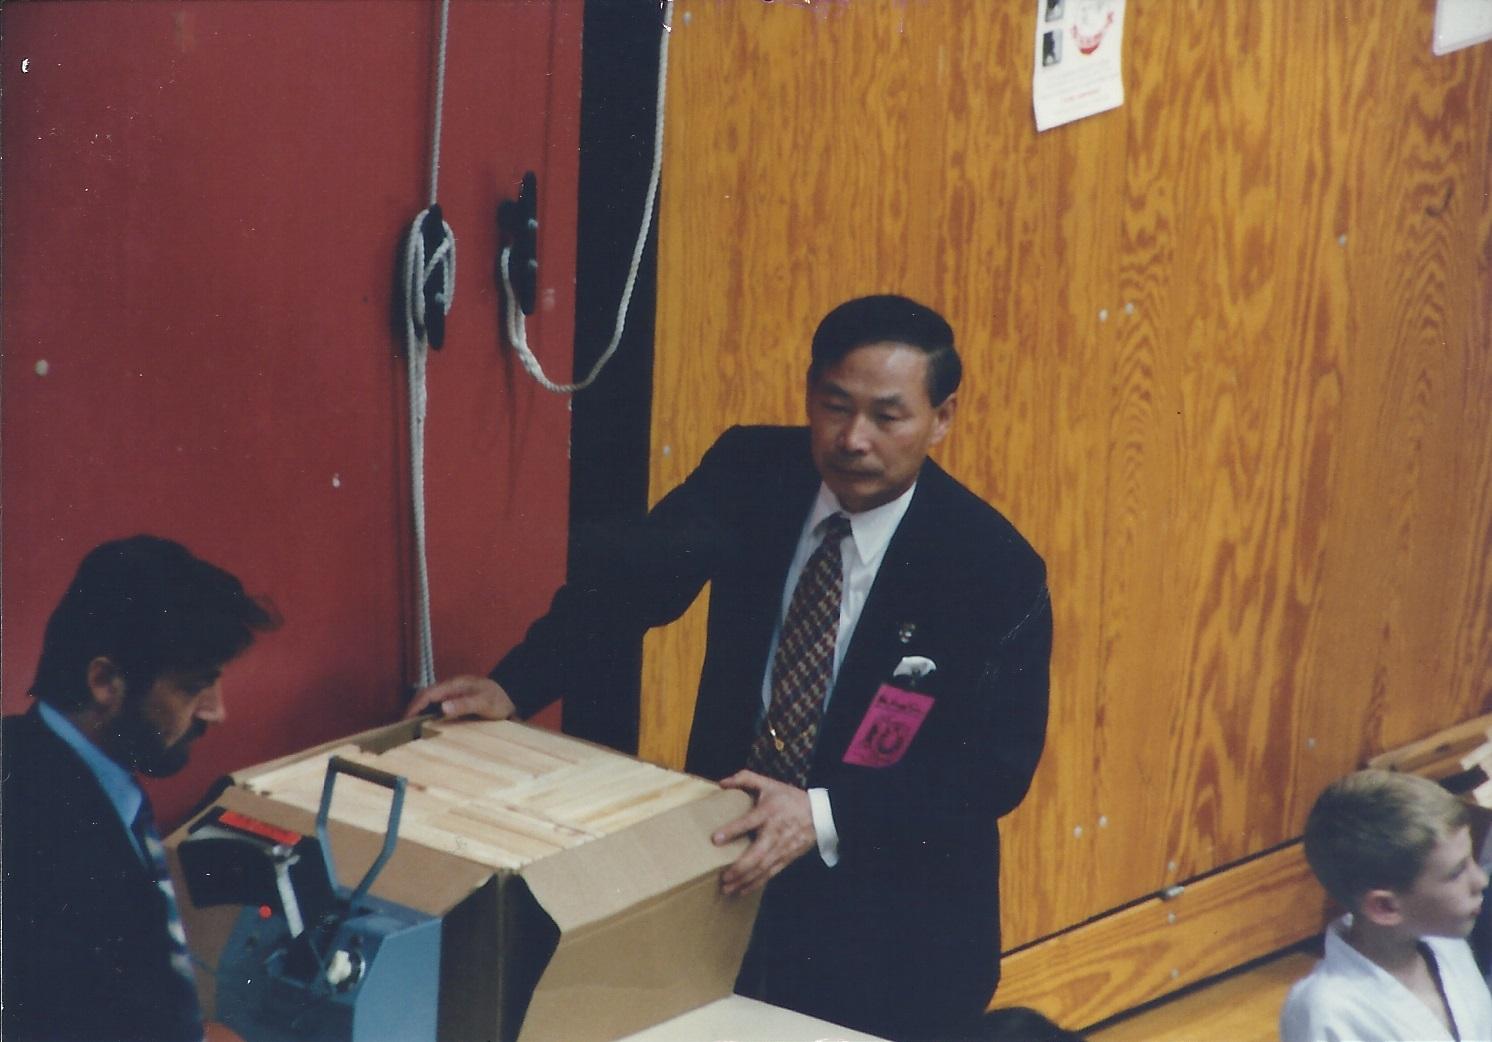 0207 US Taekwondo Cup Grandmaster Lee and Master Lemire 1996-10.jpg